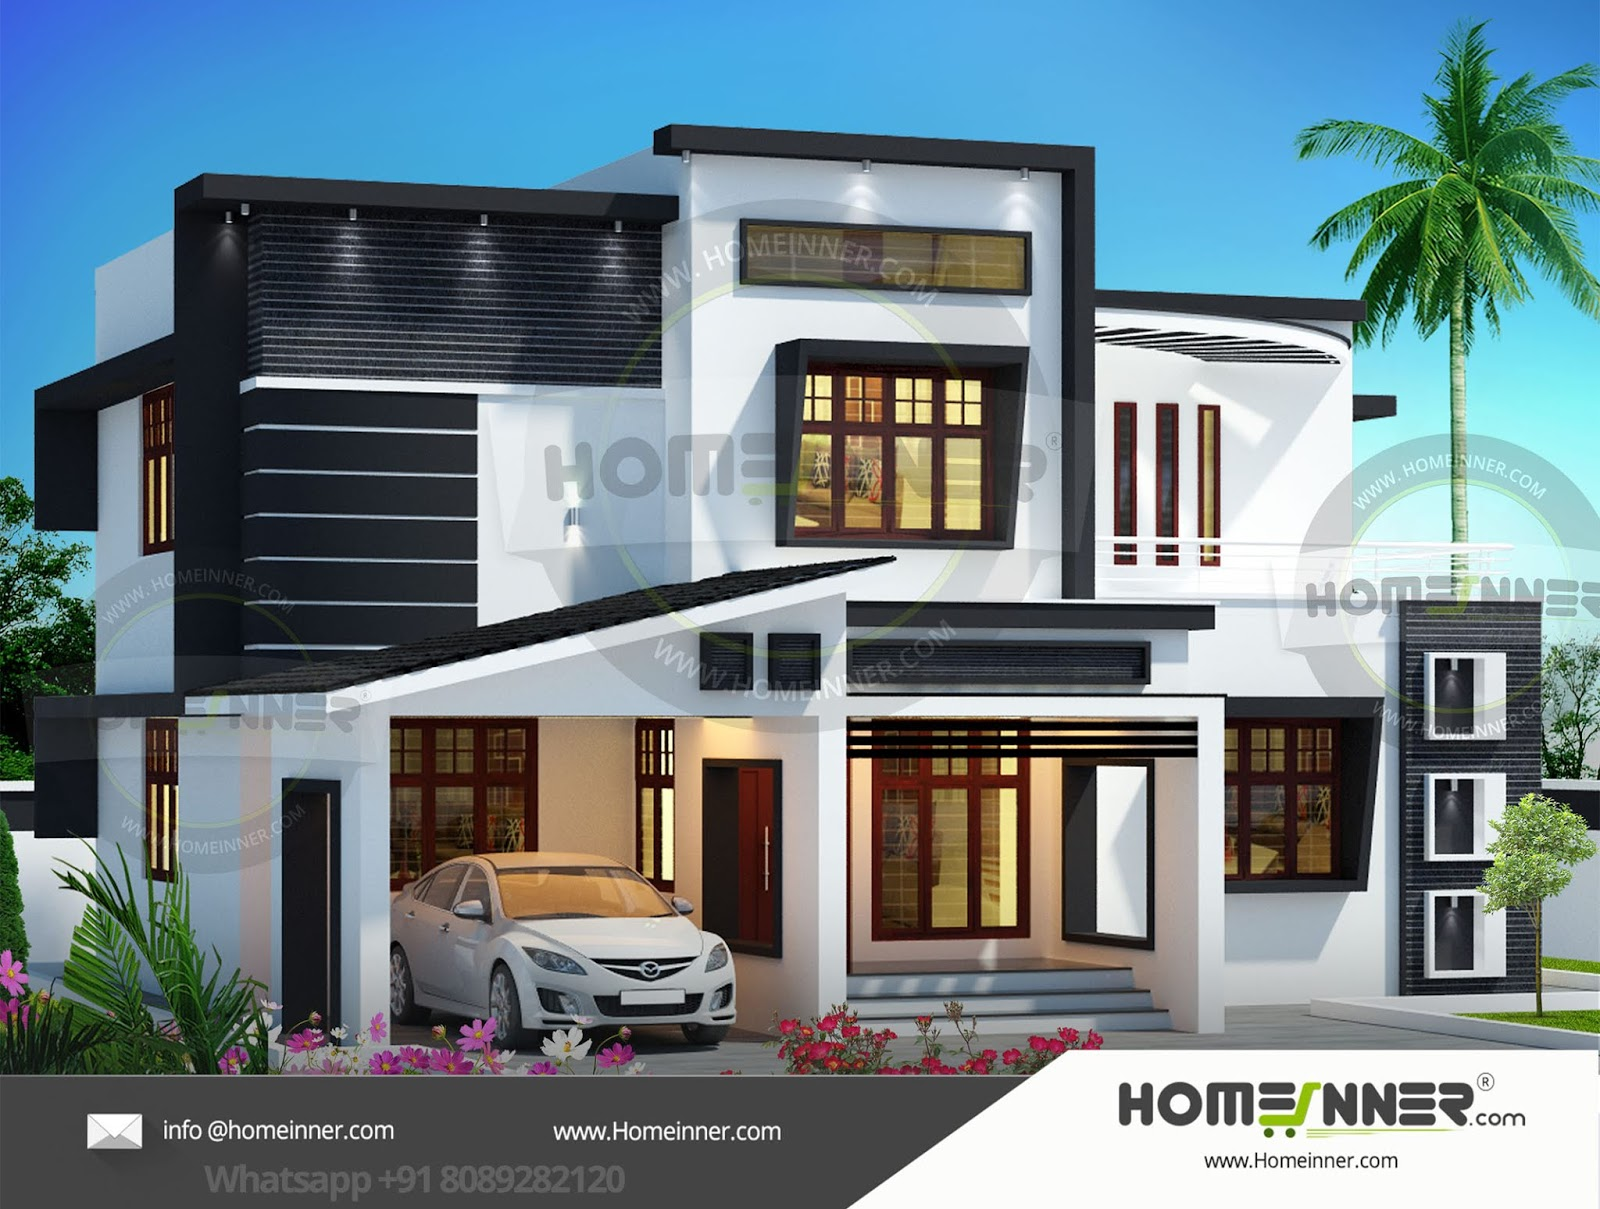 21 Lakh 3 BHK 1607 sq ft Ichalkaranji Villa